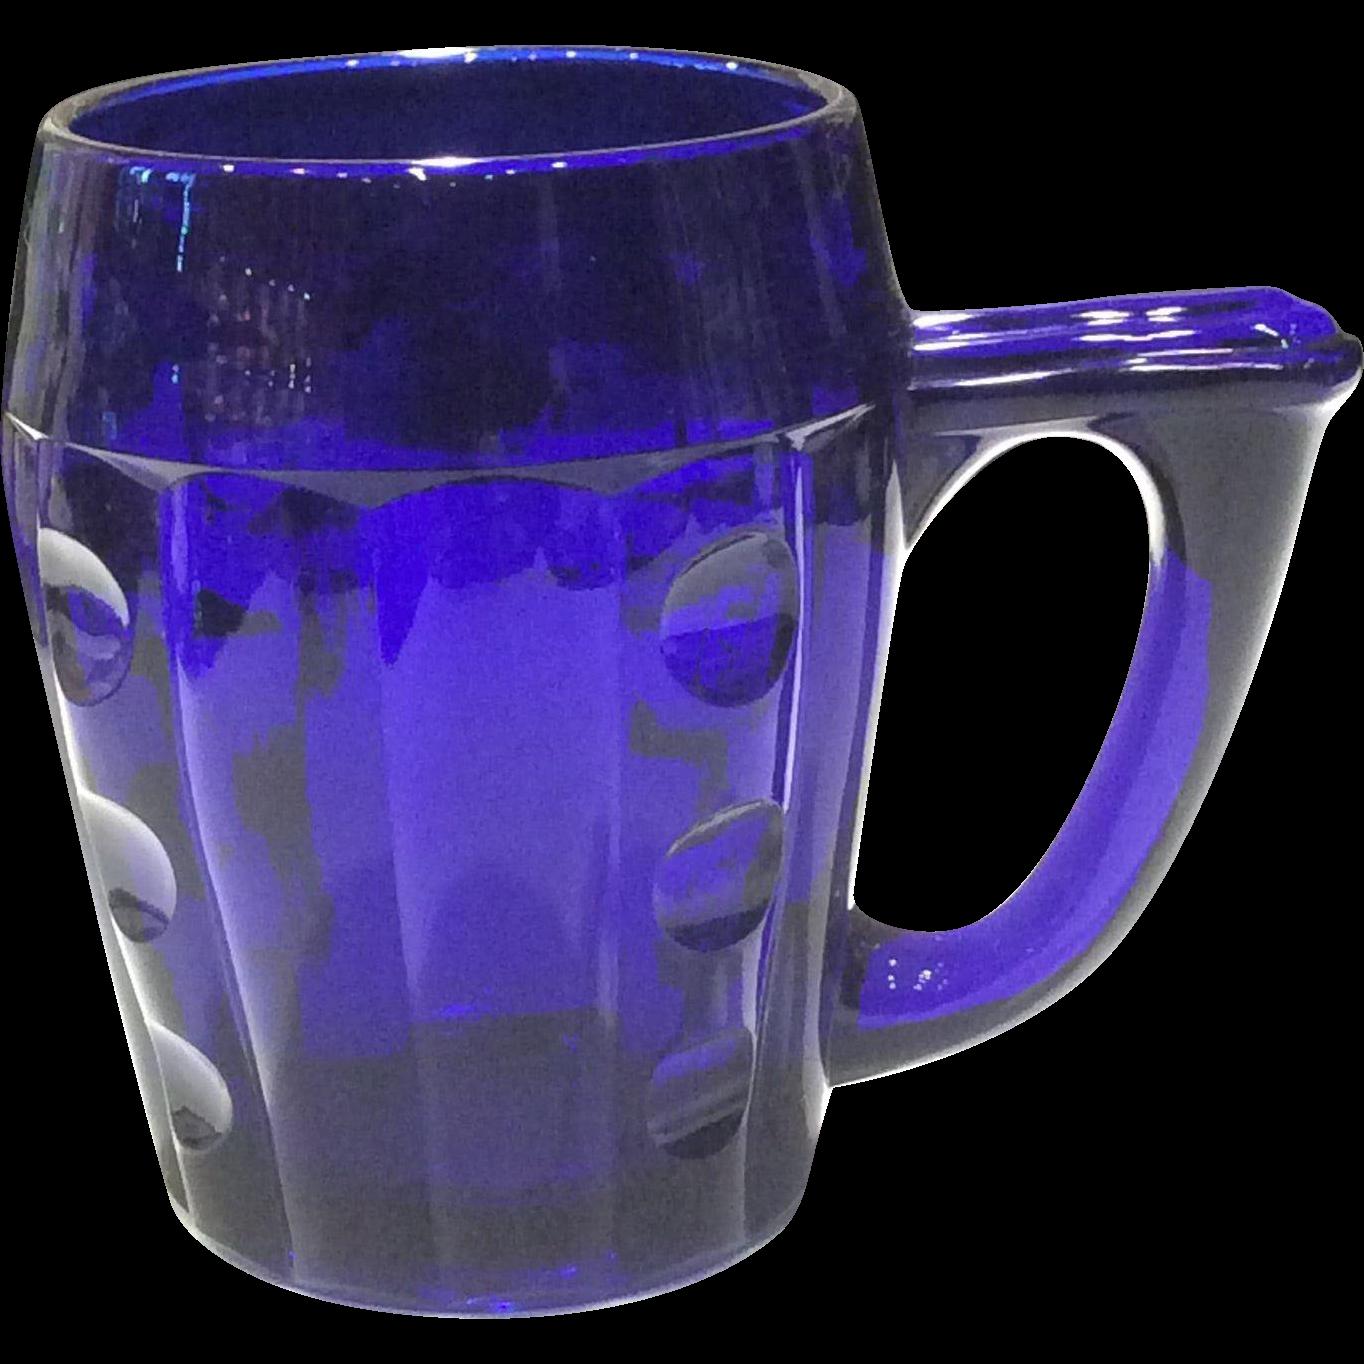 Heisey #1404 Cobalt (Steigel) Blue Old Sandwich Handled 12 ounce Mug